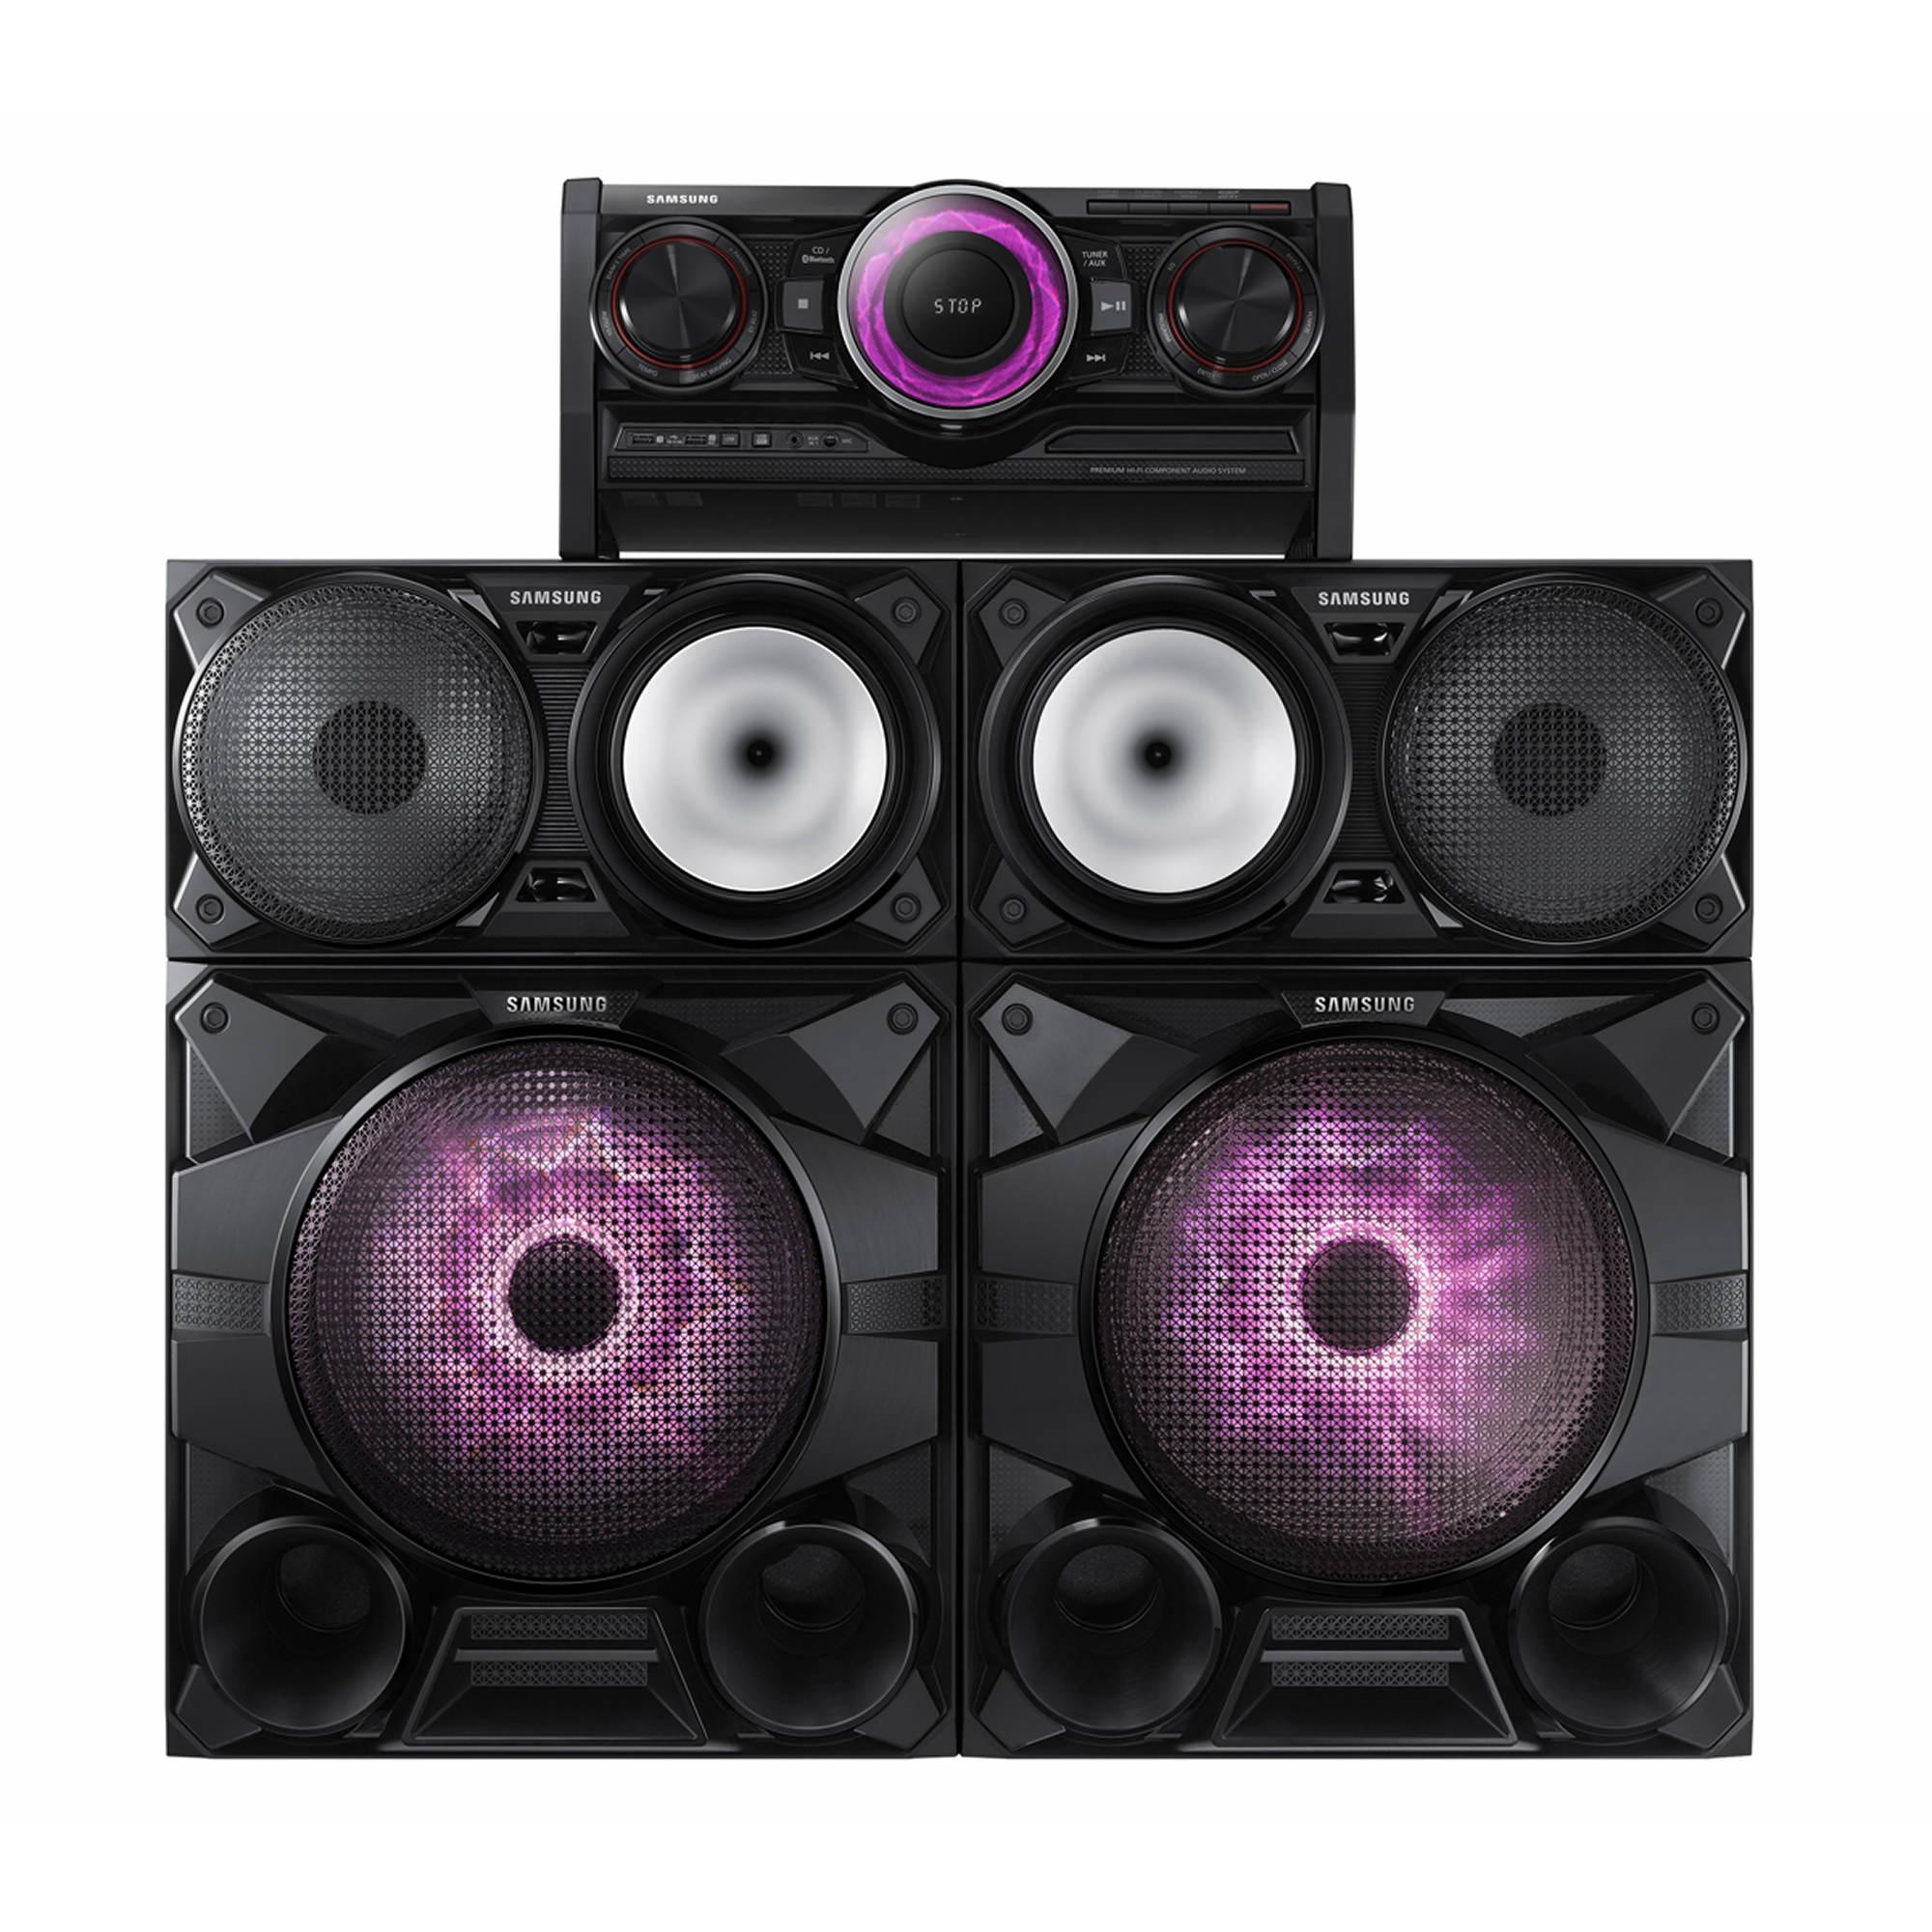 samsung mx hs7000 2300w giga system bjs wholesale club. Black Bedroom Furniture Sets. Home Design Ideas